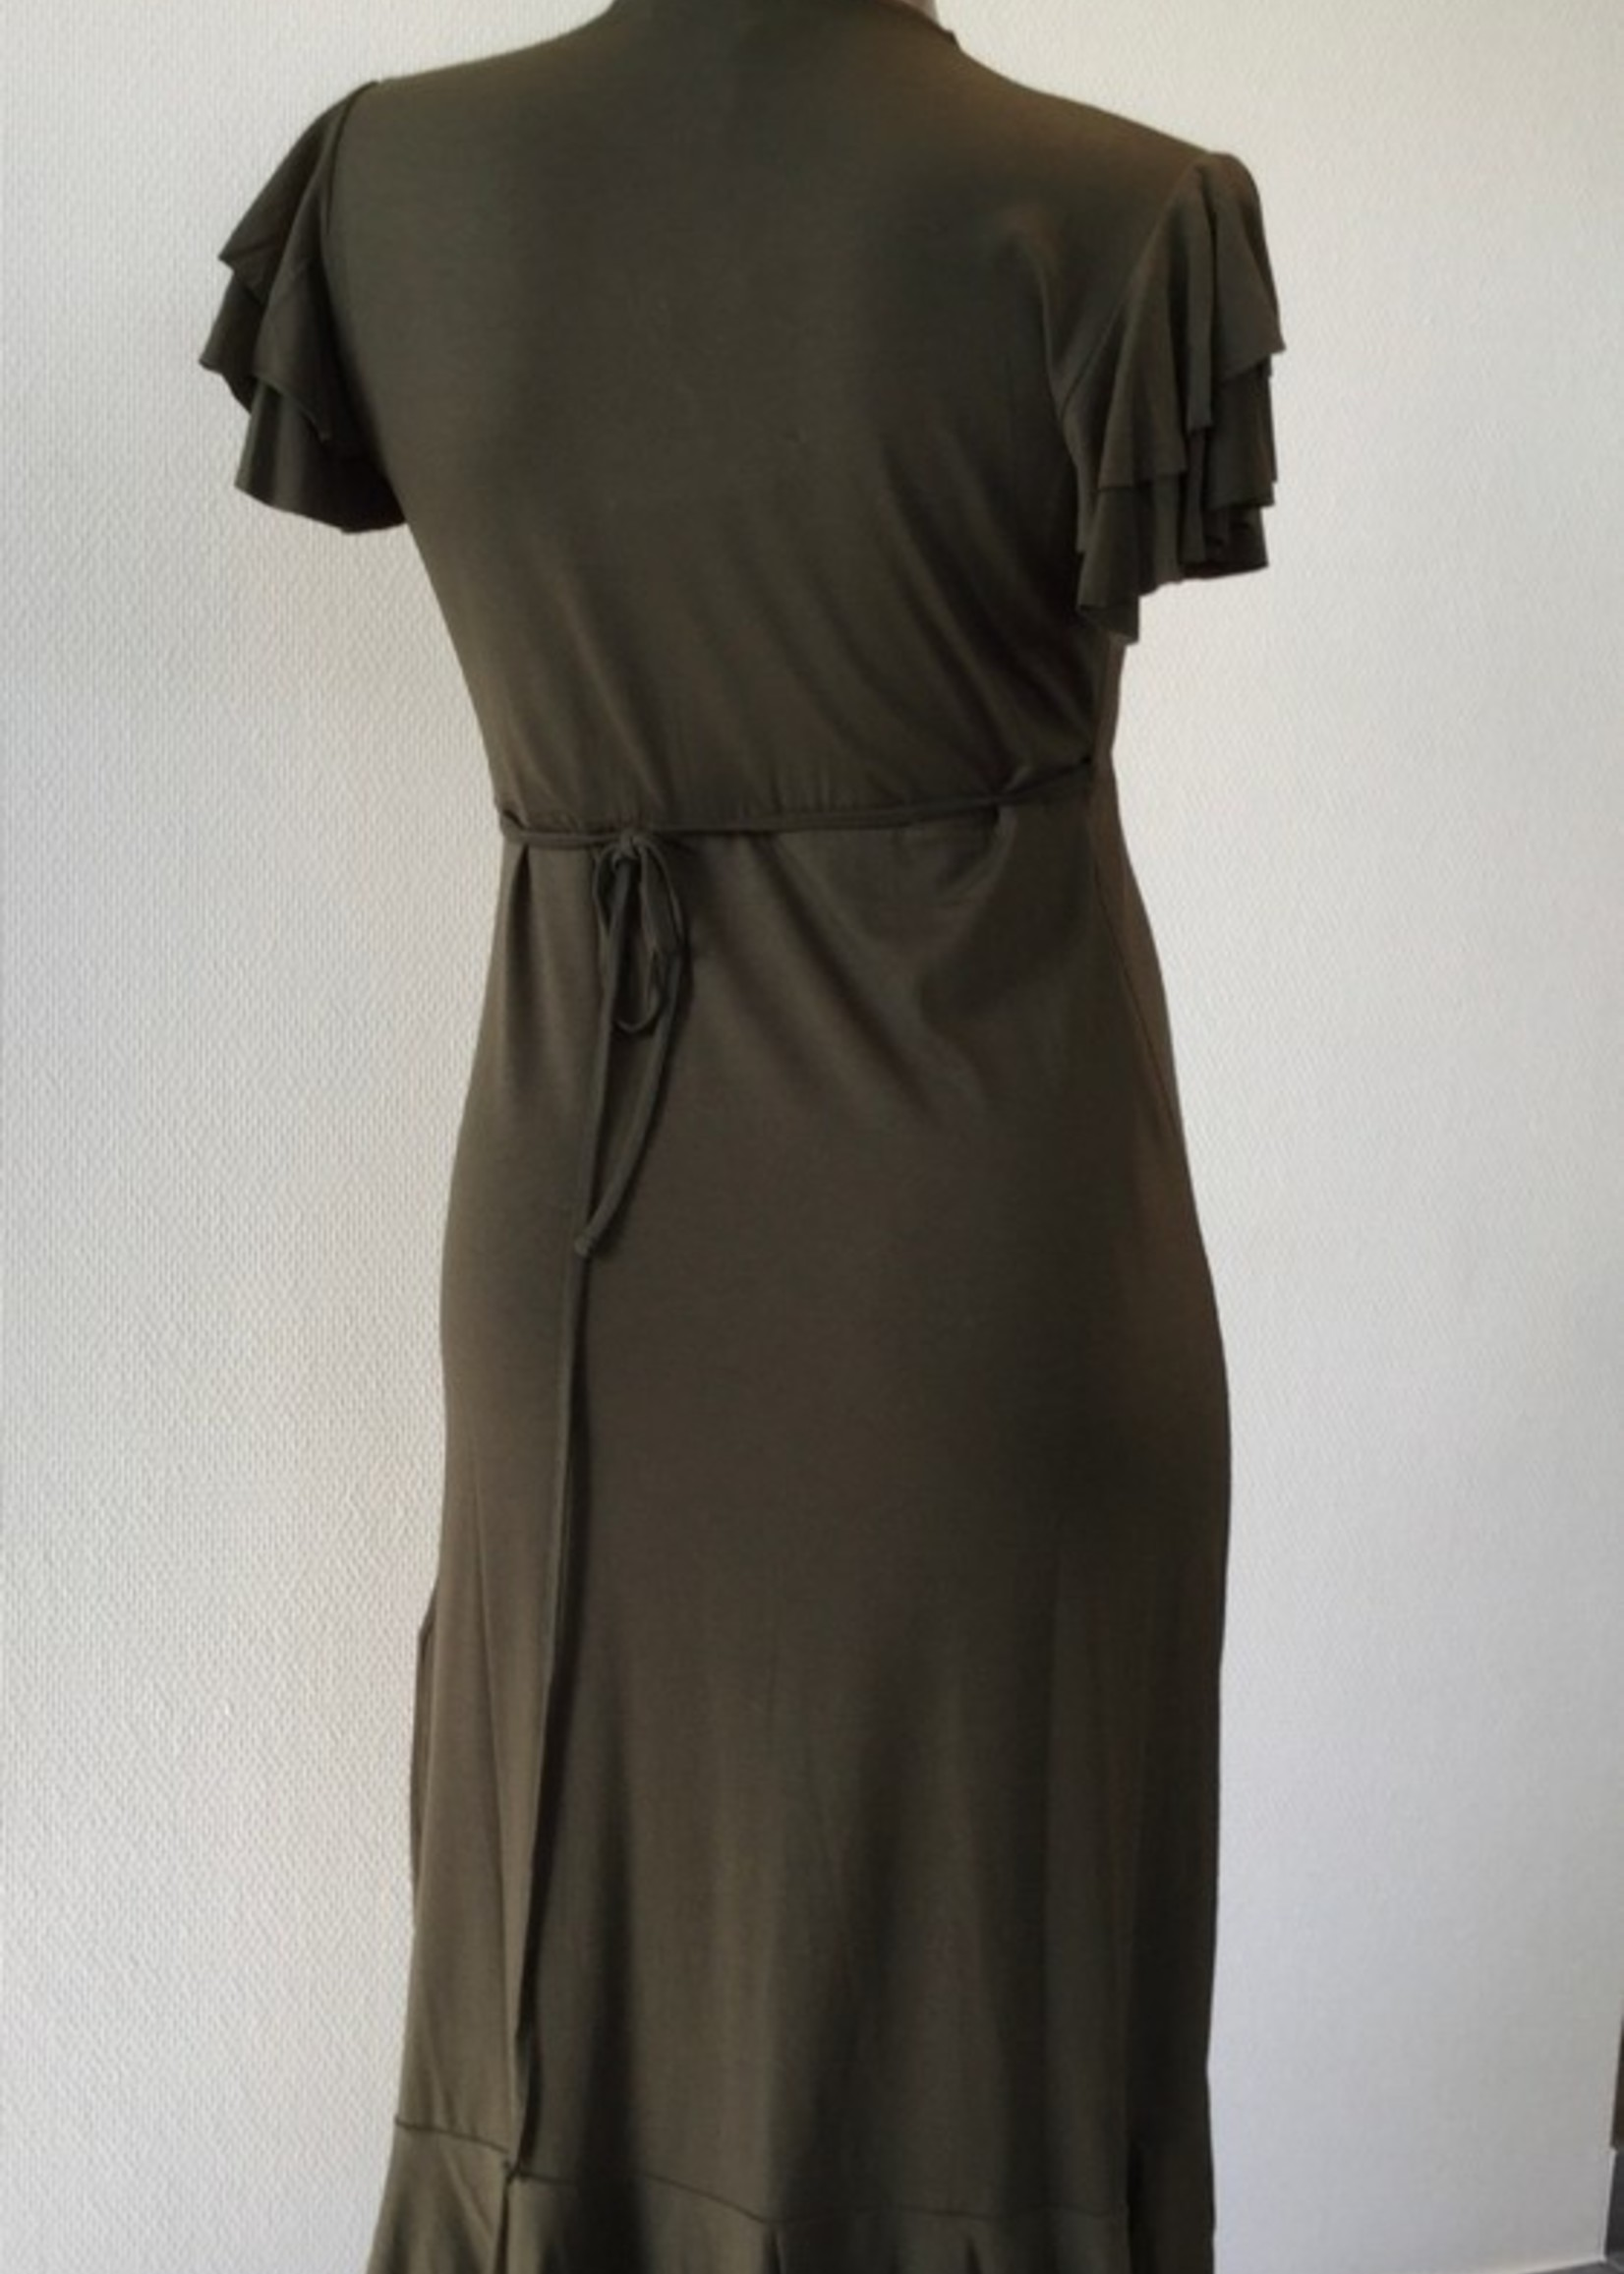 PIETRO BRUNELLI DRESS DAISY AG0088